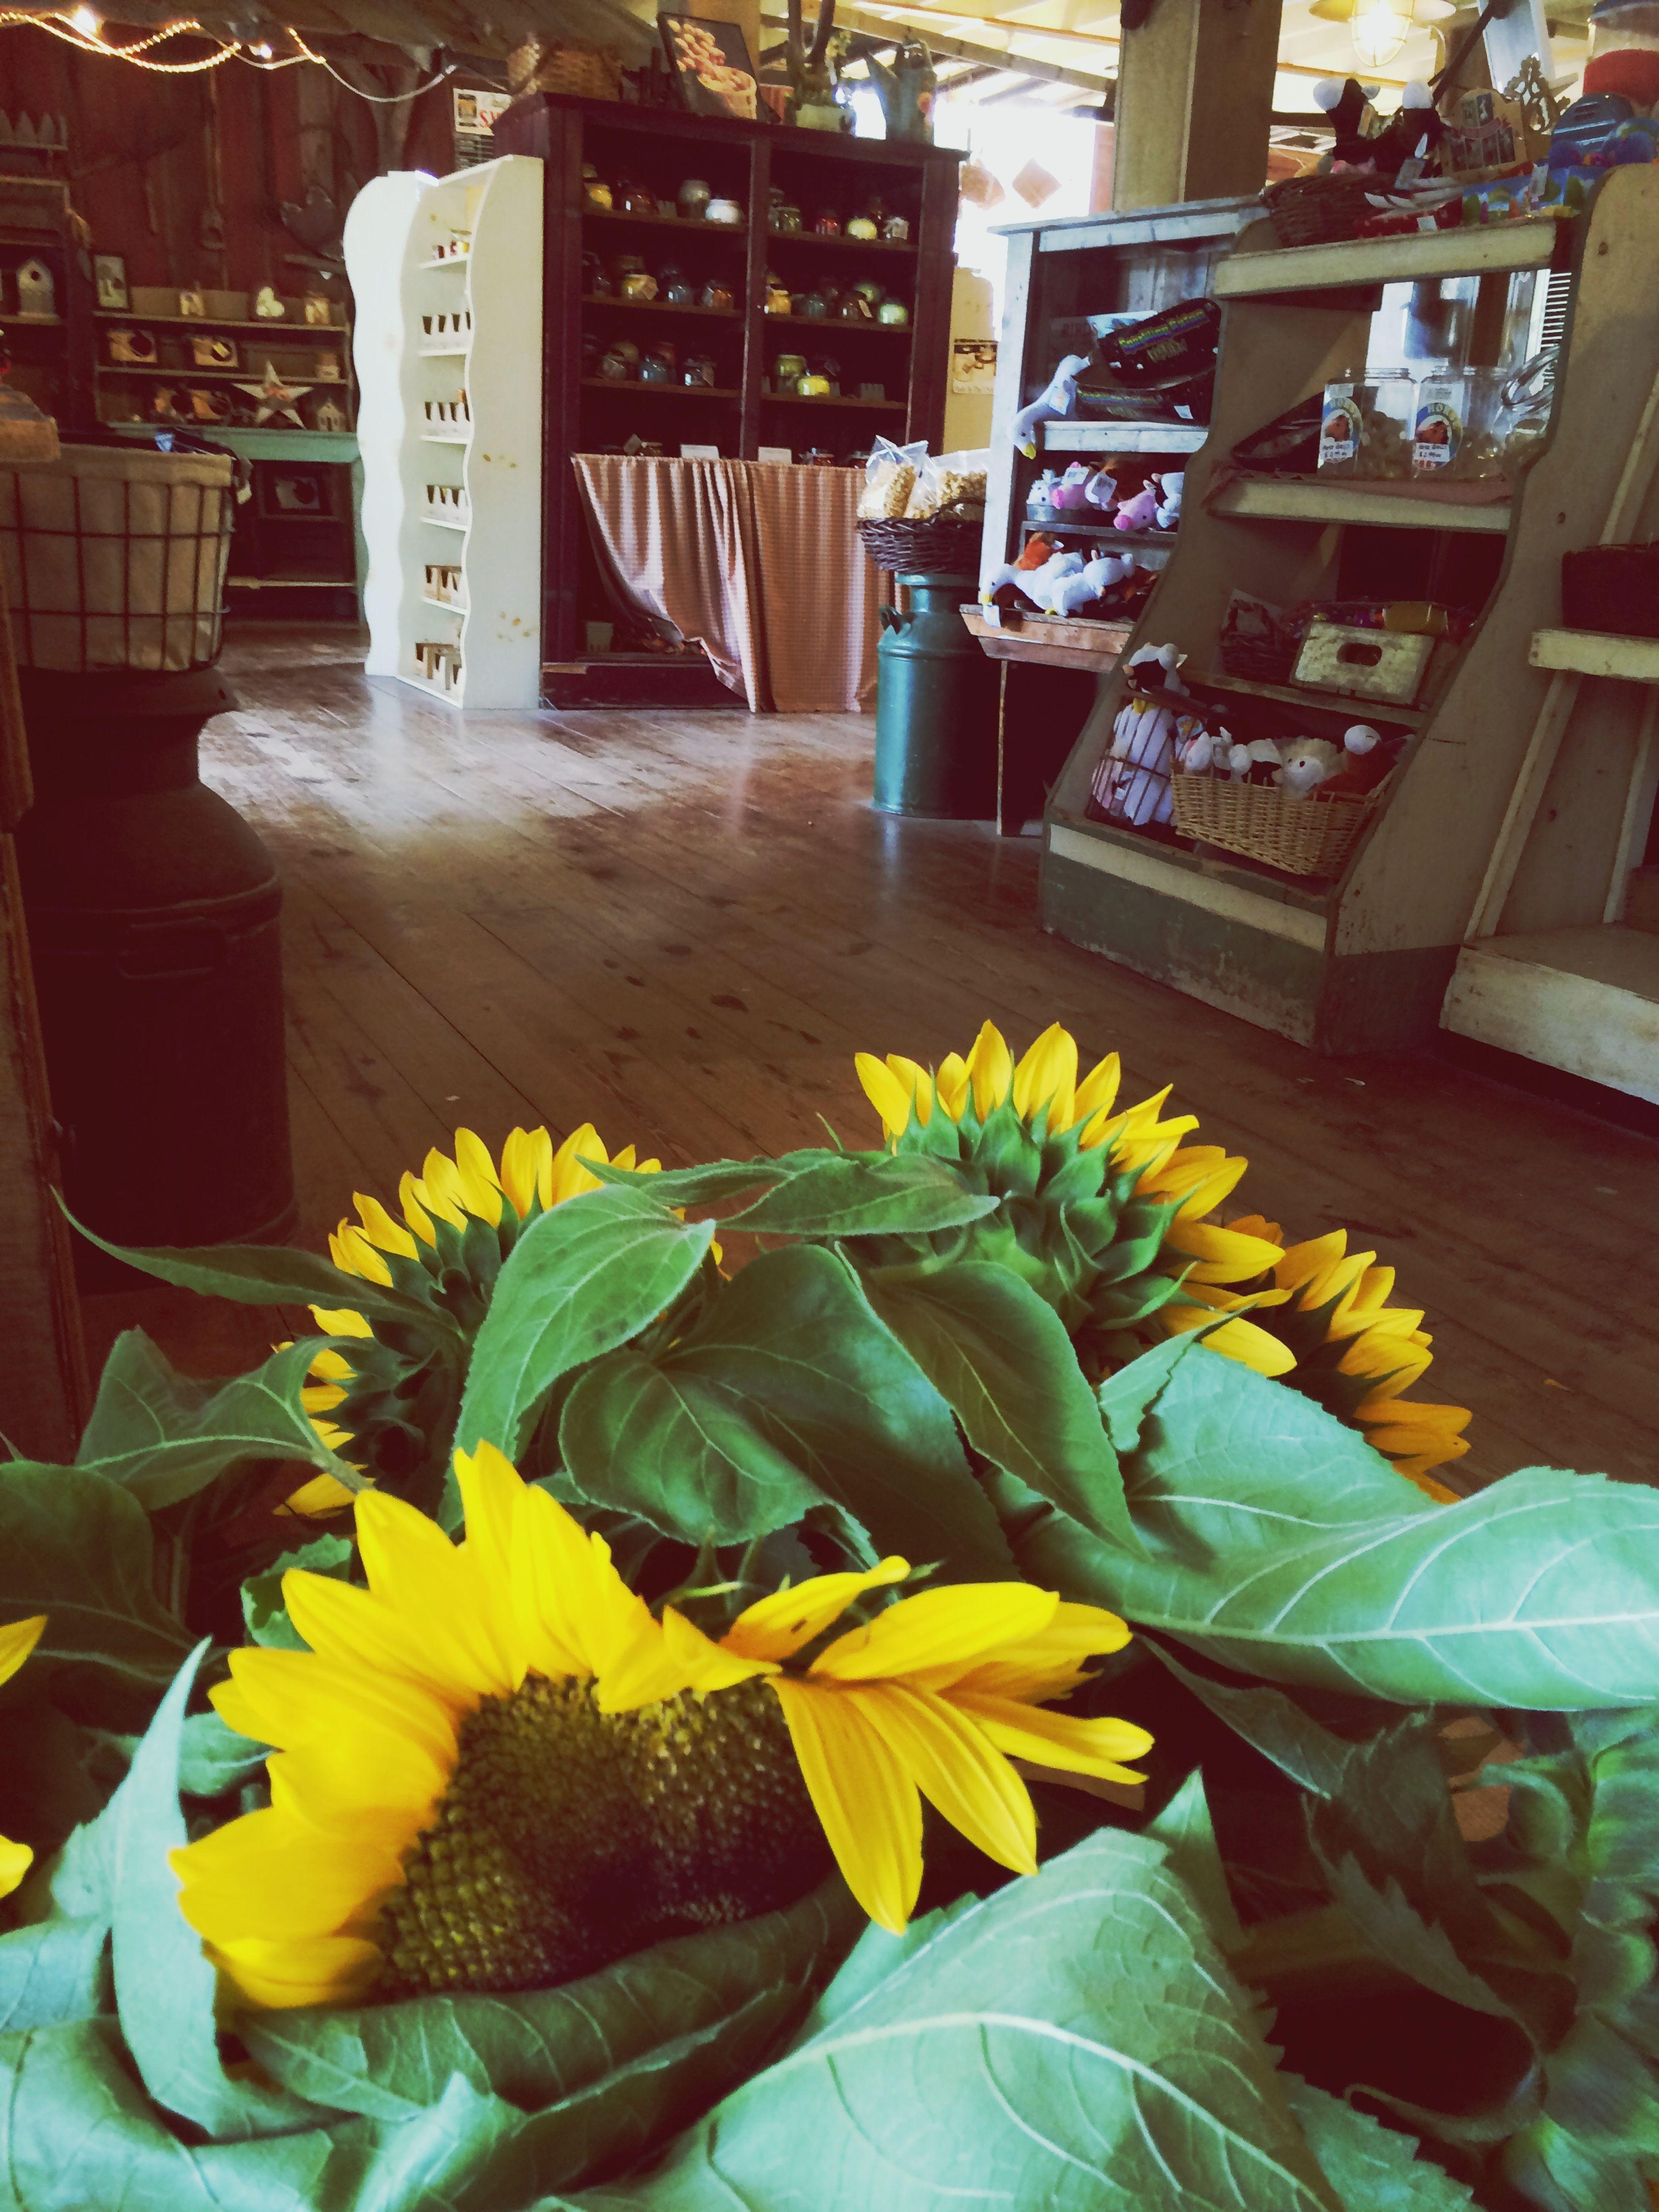 Farmers market and sunflowers? Lovely Sunflower Farmers Market